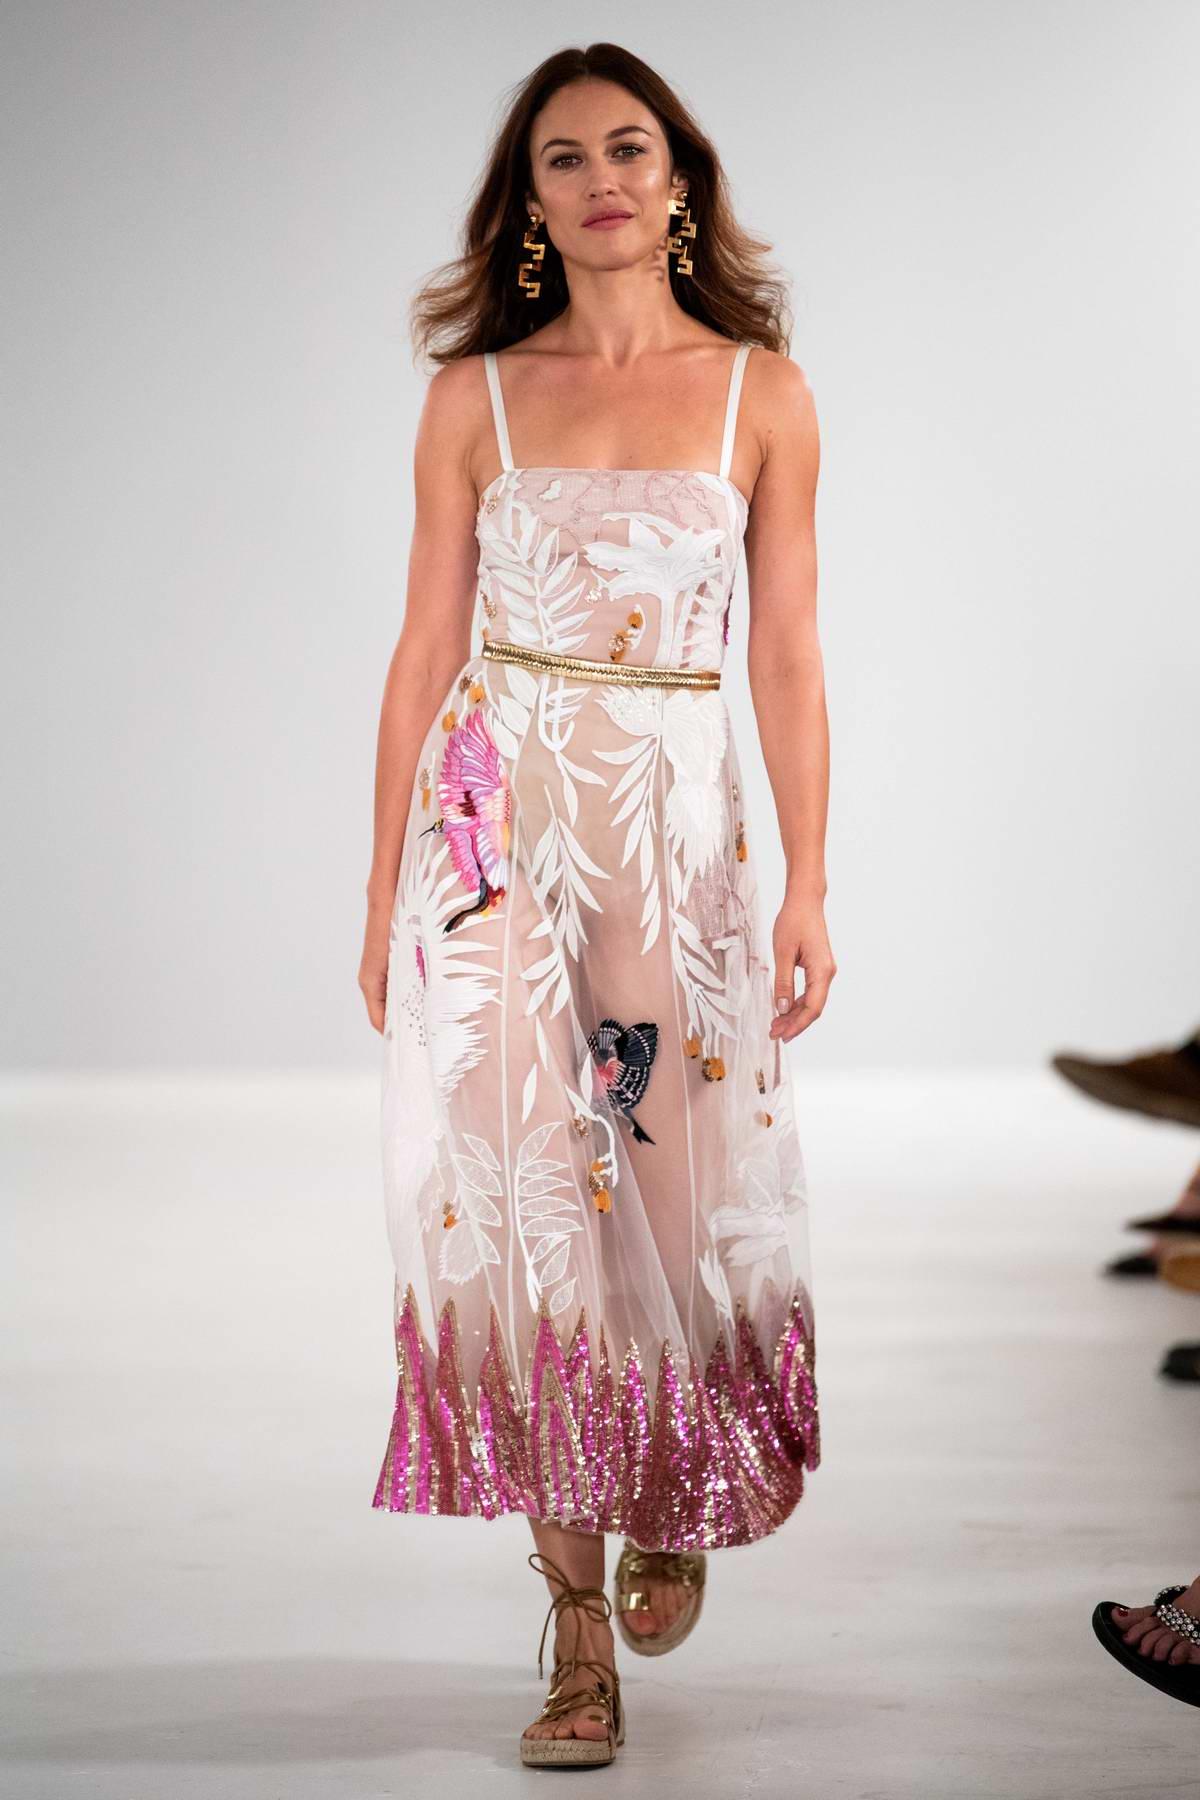 Olga Kurylenko walks the runway at Temperley London Show, Spring/Summer 2019 during London Fashion Week in London, UK